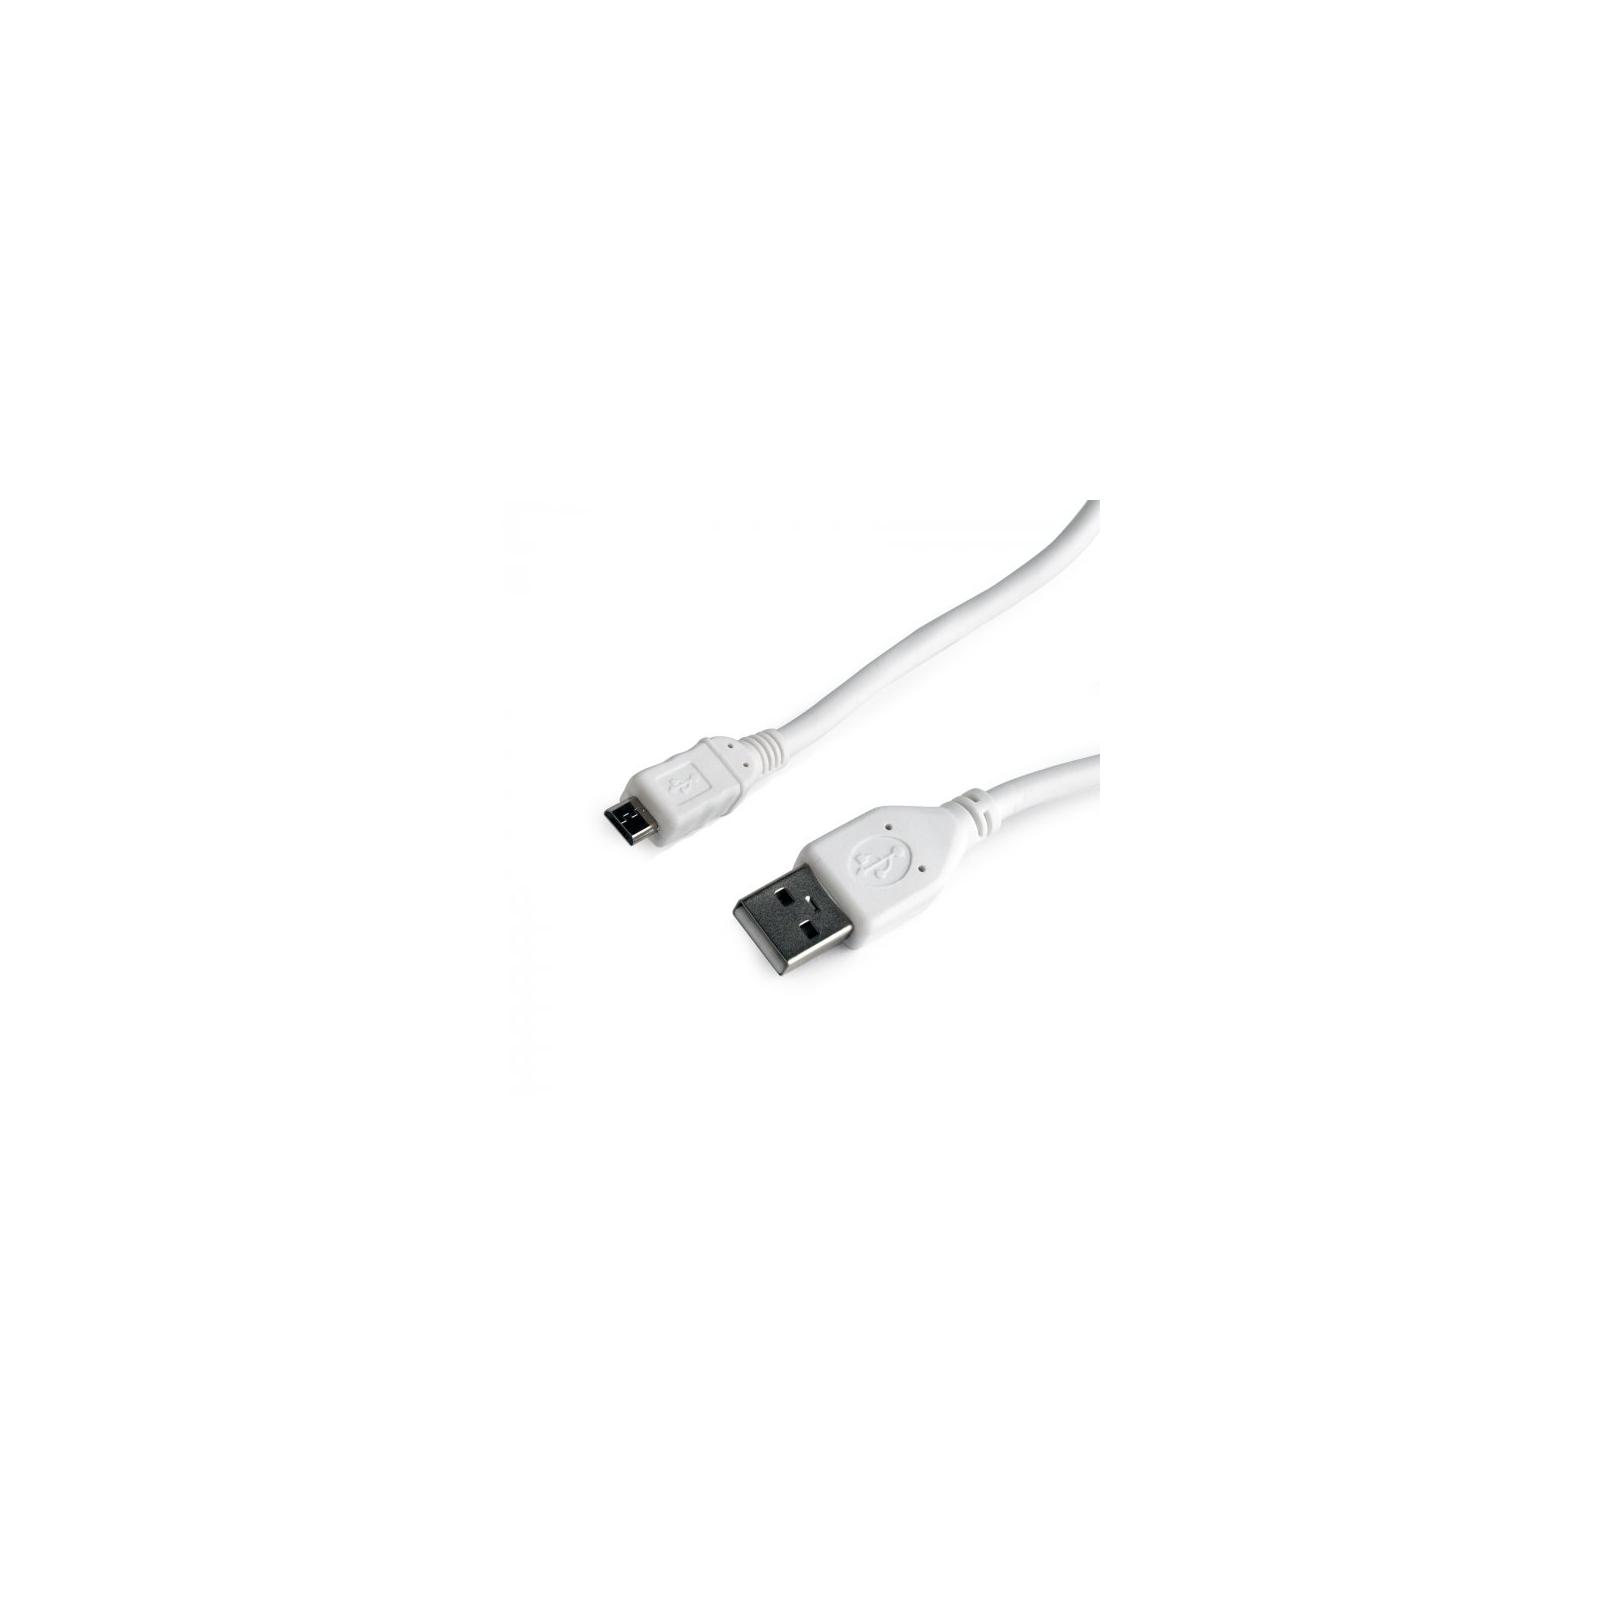 Дата кабель USB 2.0 AM to Micro 5P 0.1m Cablexpert (CCP-mUSB2-AMBM-W-0.1M)